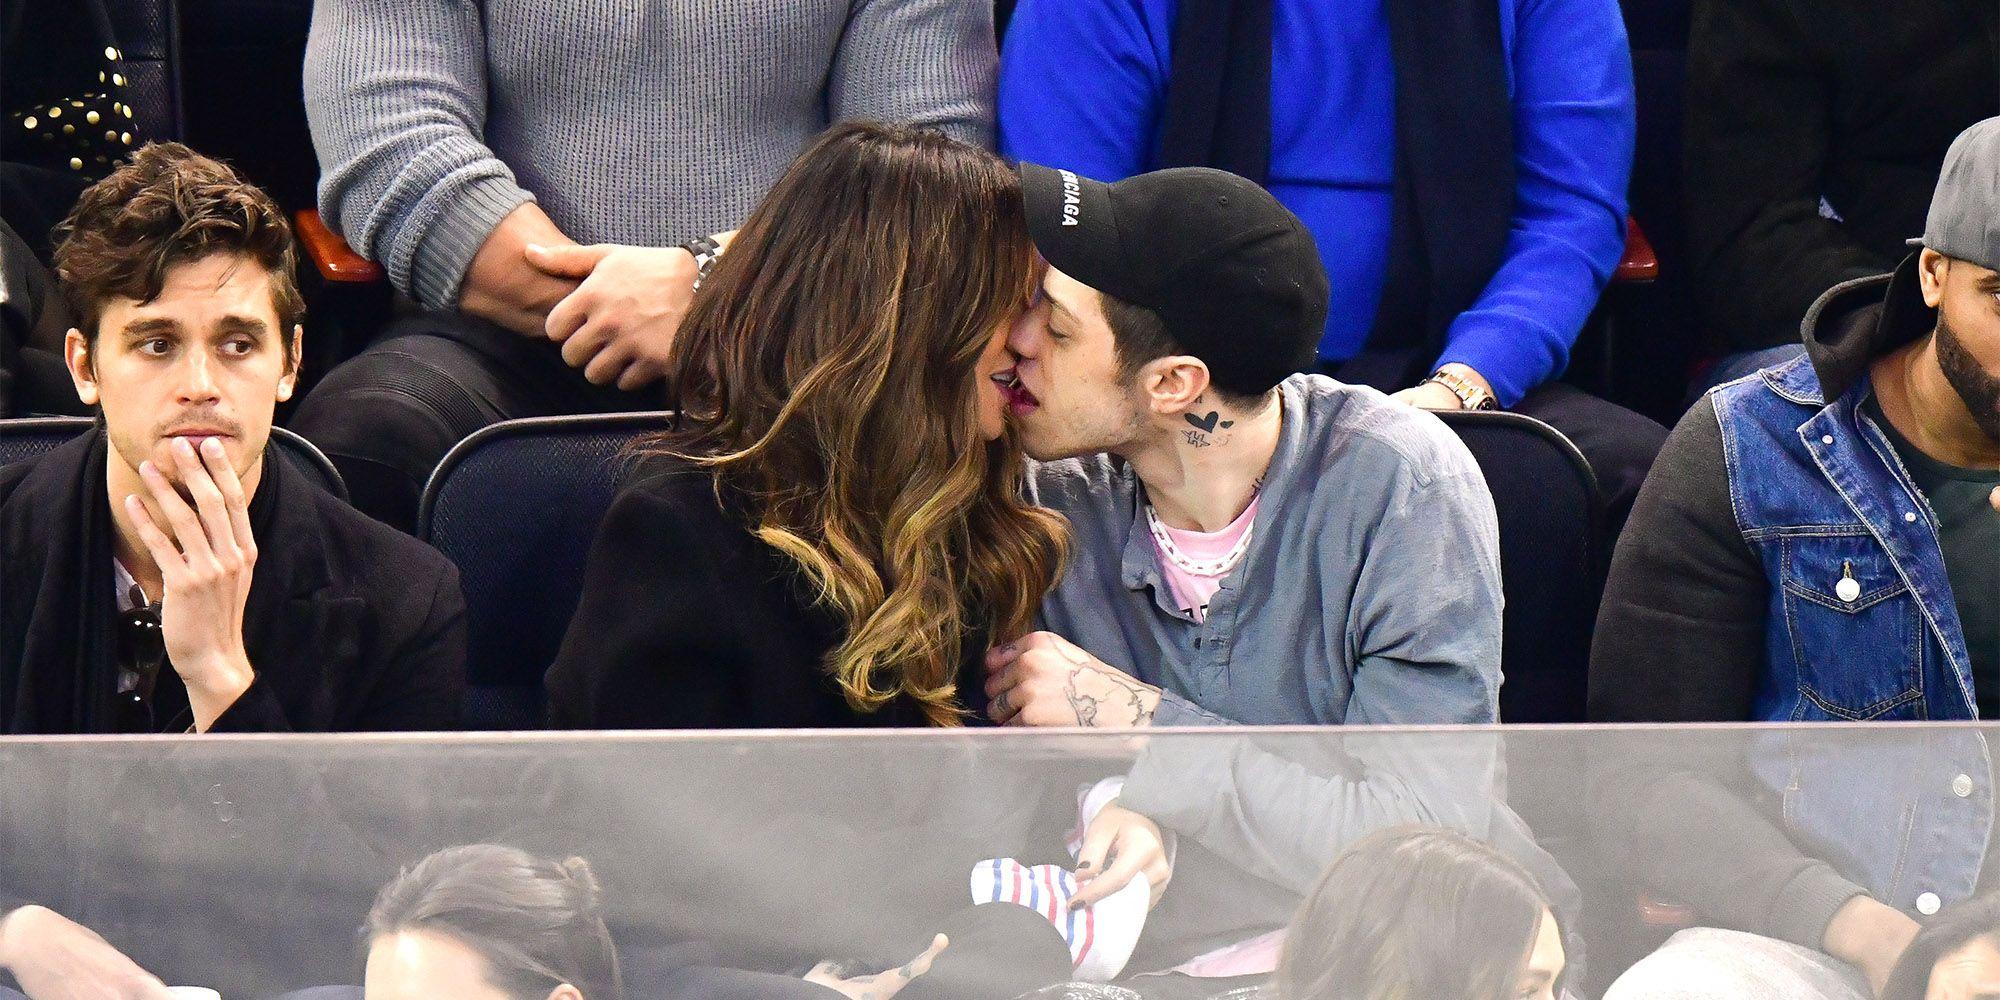 Celebrities attend New York Rangers game, New York, USA - 03 Mar 2019